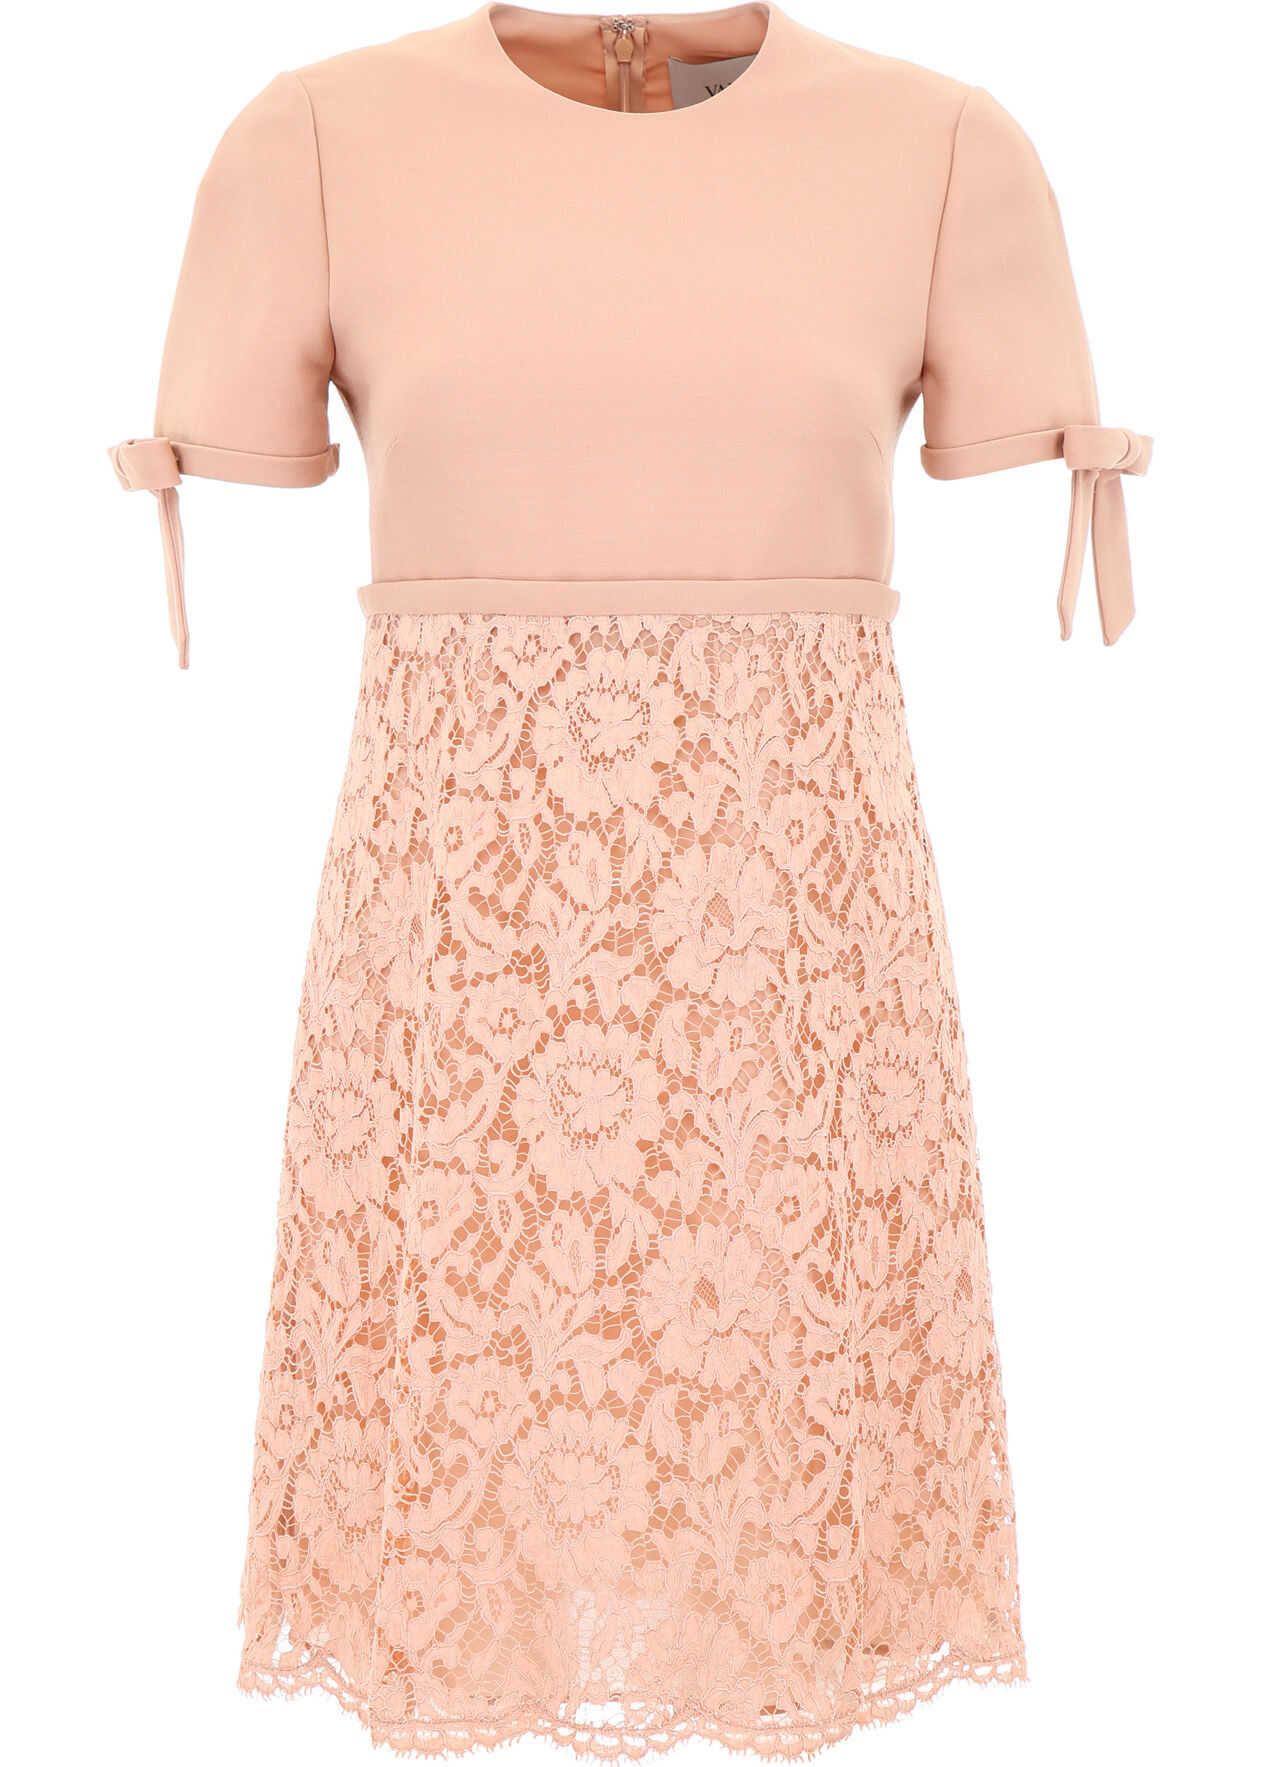 Valentino Garavani Lace Mini Dress ROSE MIST